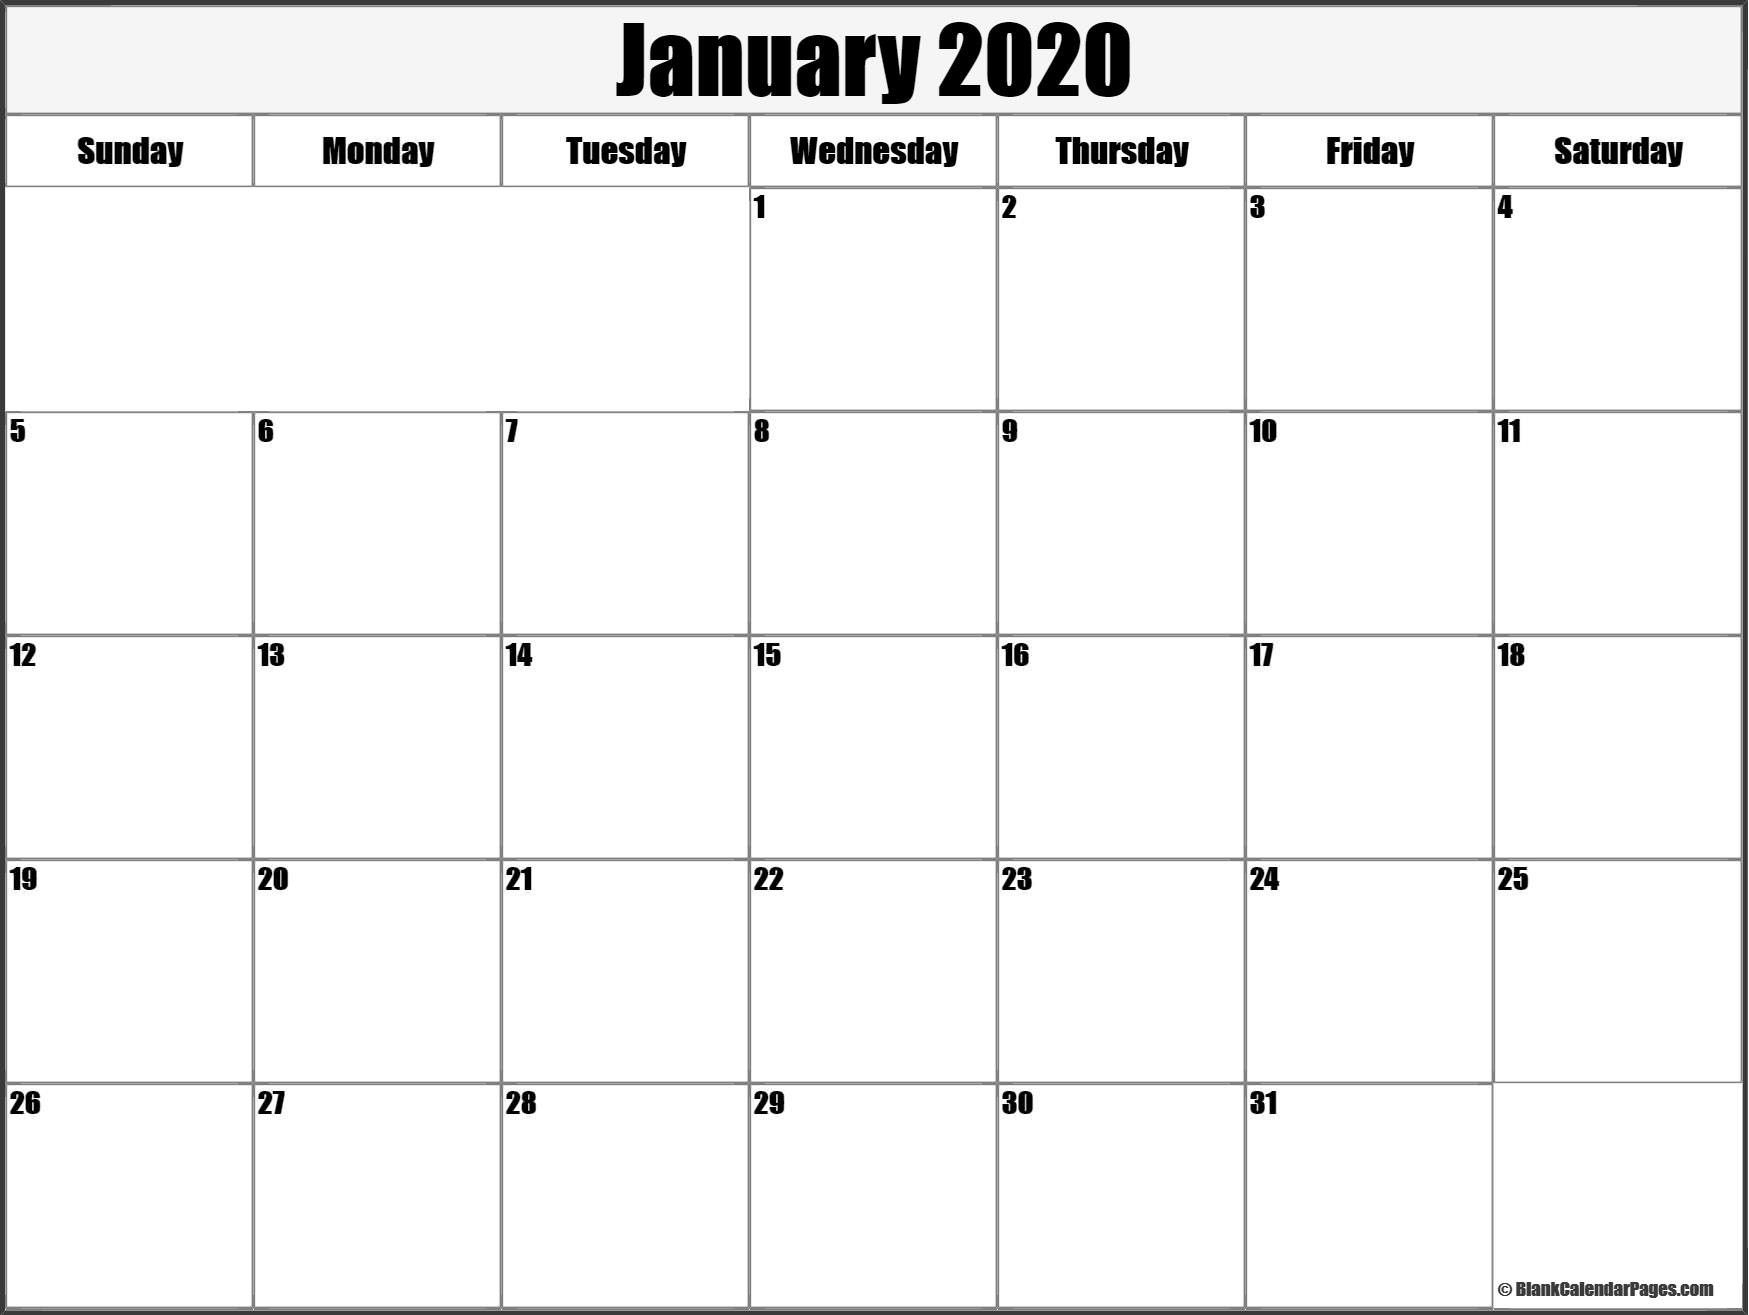 January 2020 Calendar Template #january #january2020